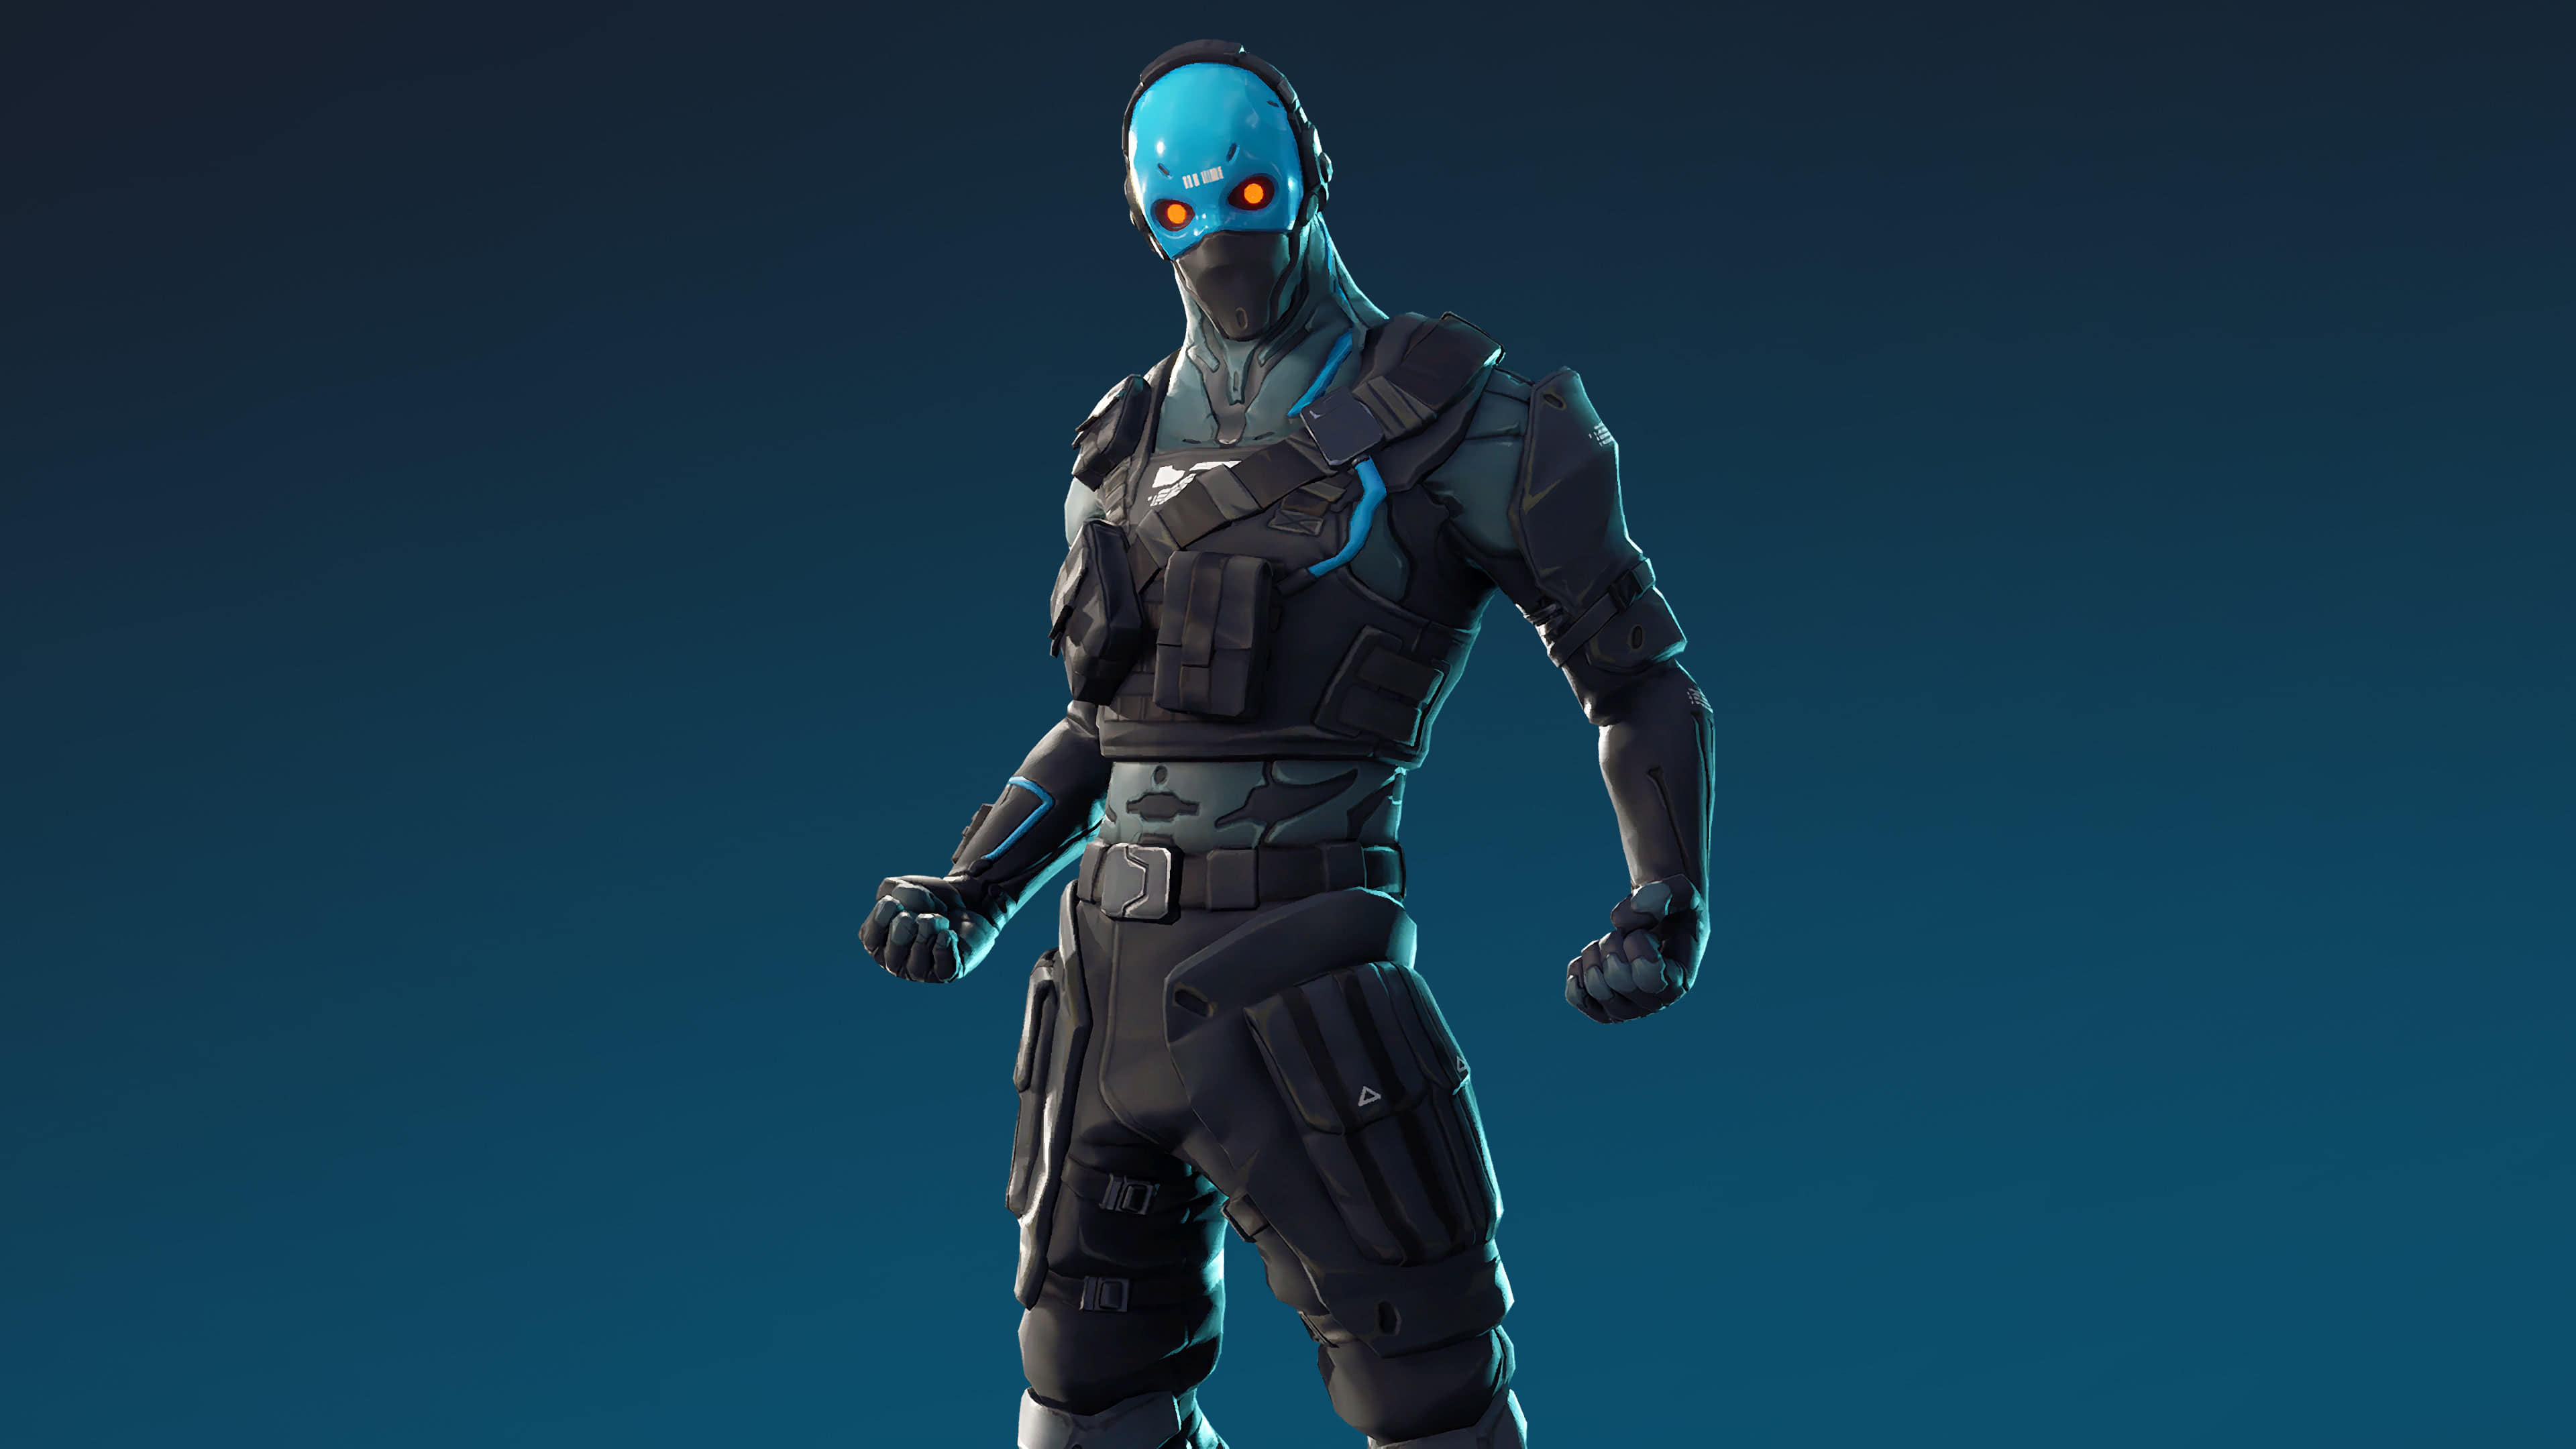 fortnite cobalt skin outfit uhd 4k wallpaper